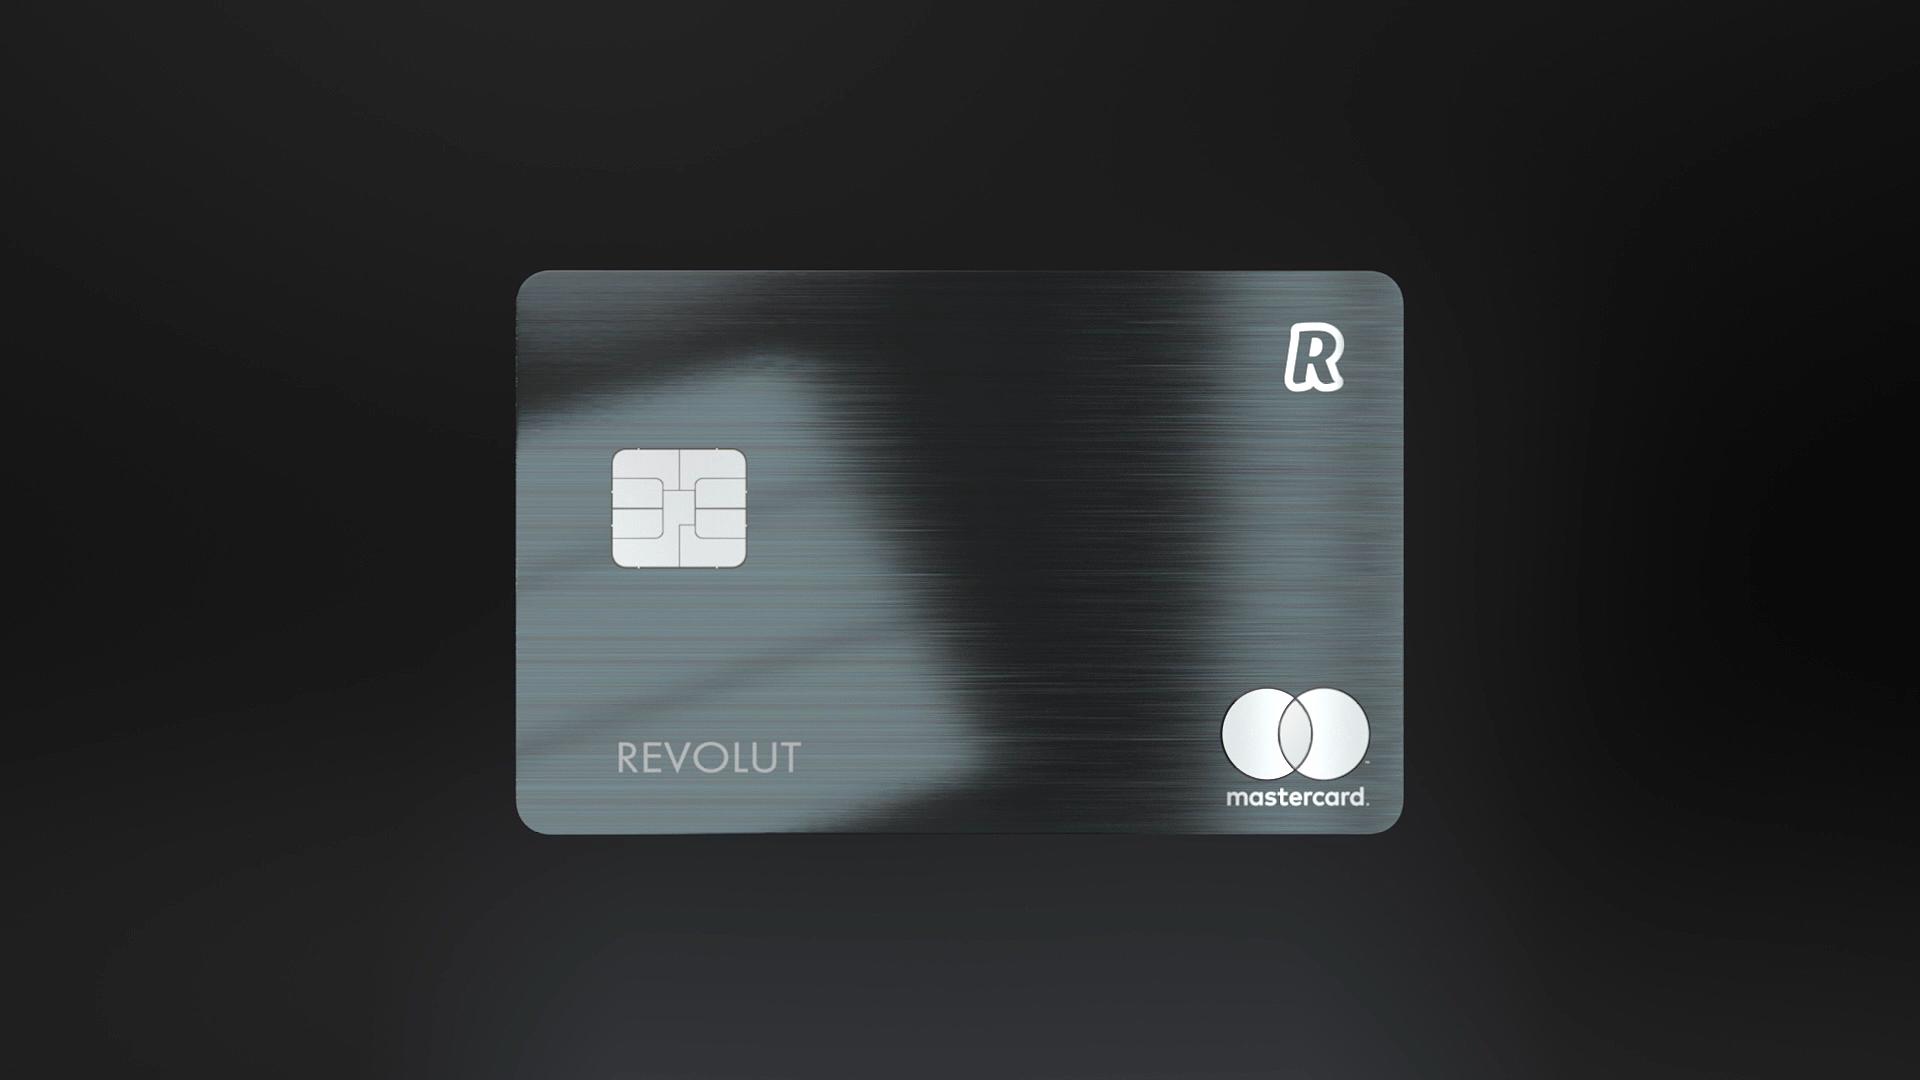 Revolut introduces a metal card | TechCrunch